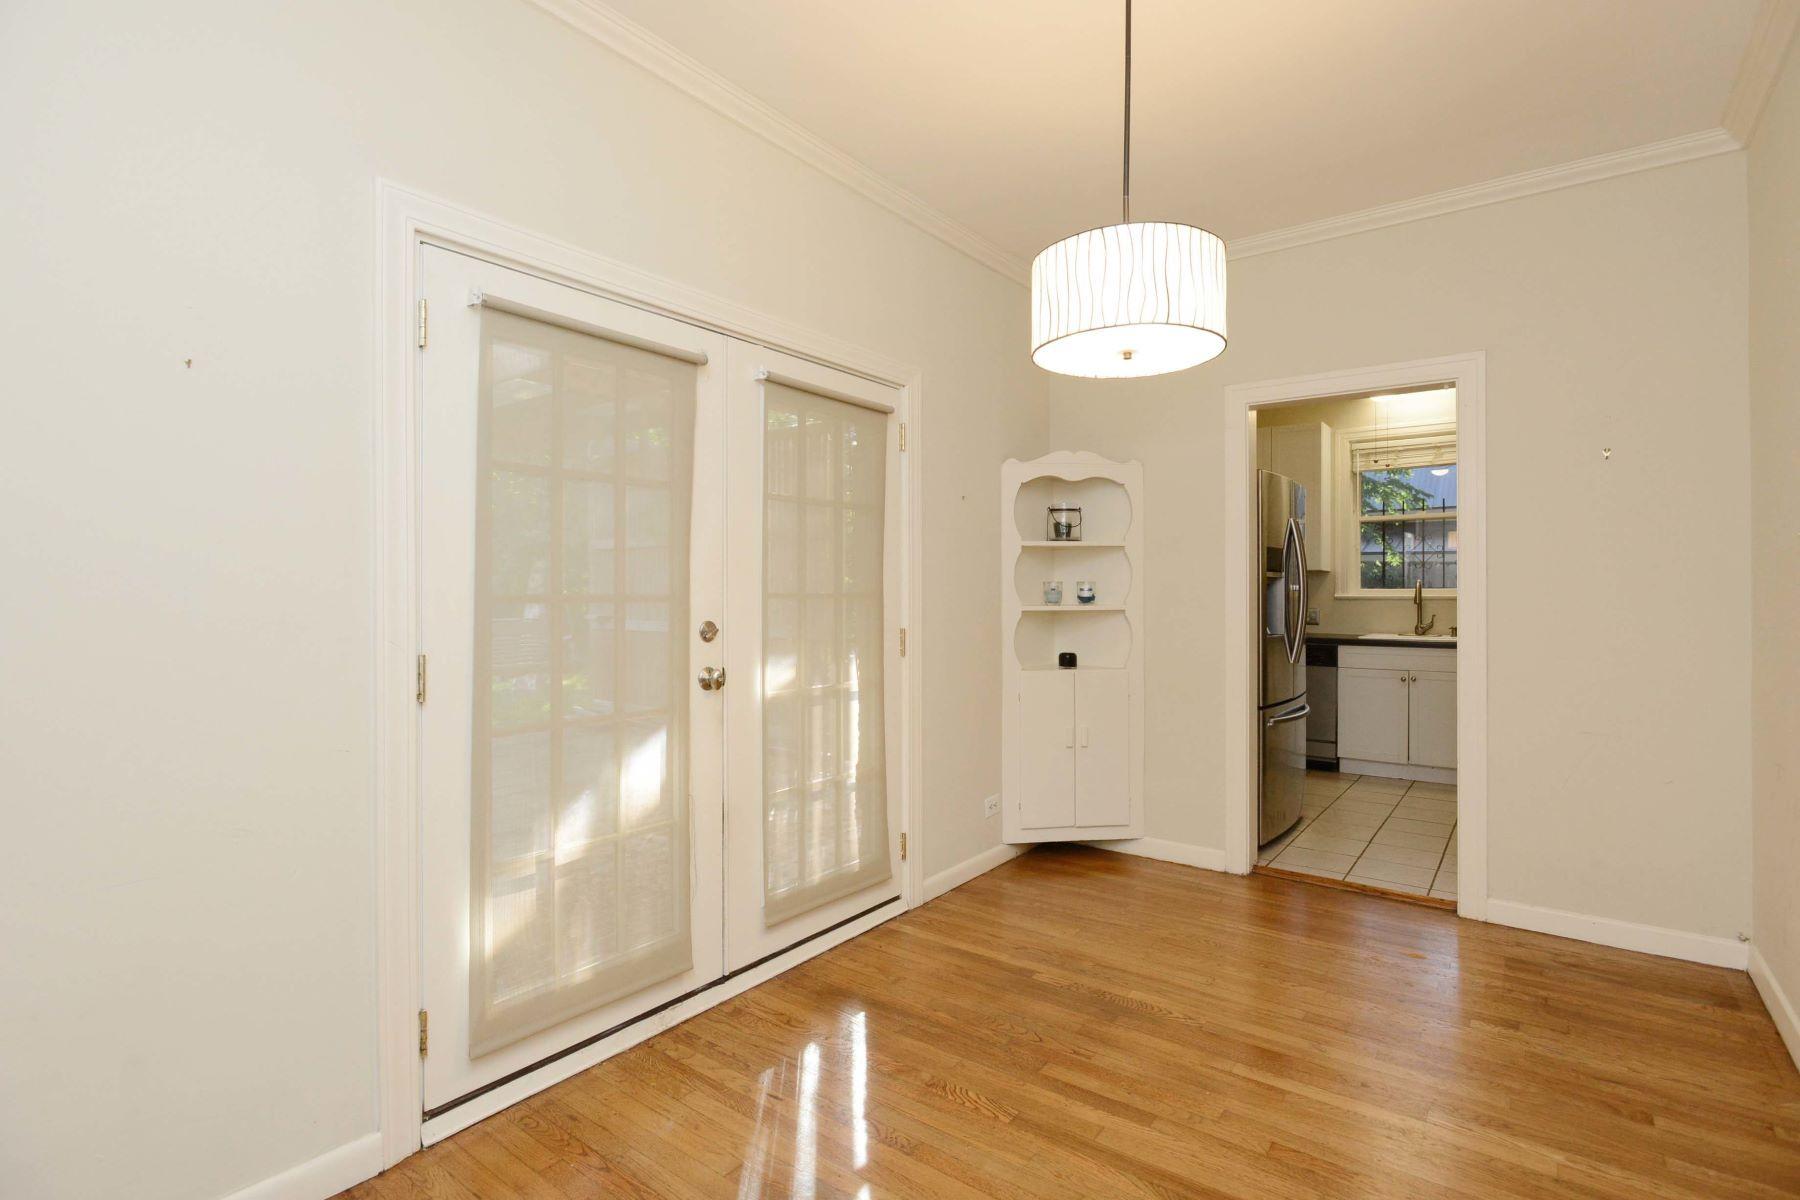 Additional photo for property listing at 238 Lovera Blvd 238 Lovera Blvd San Antonio, Texas 78212 Estados Unidos